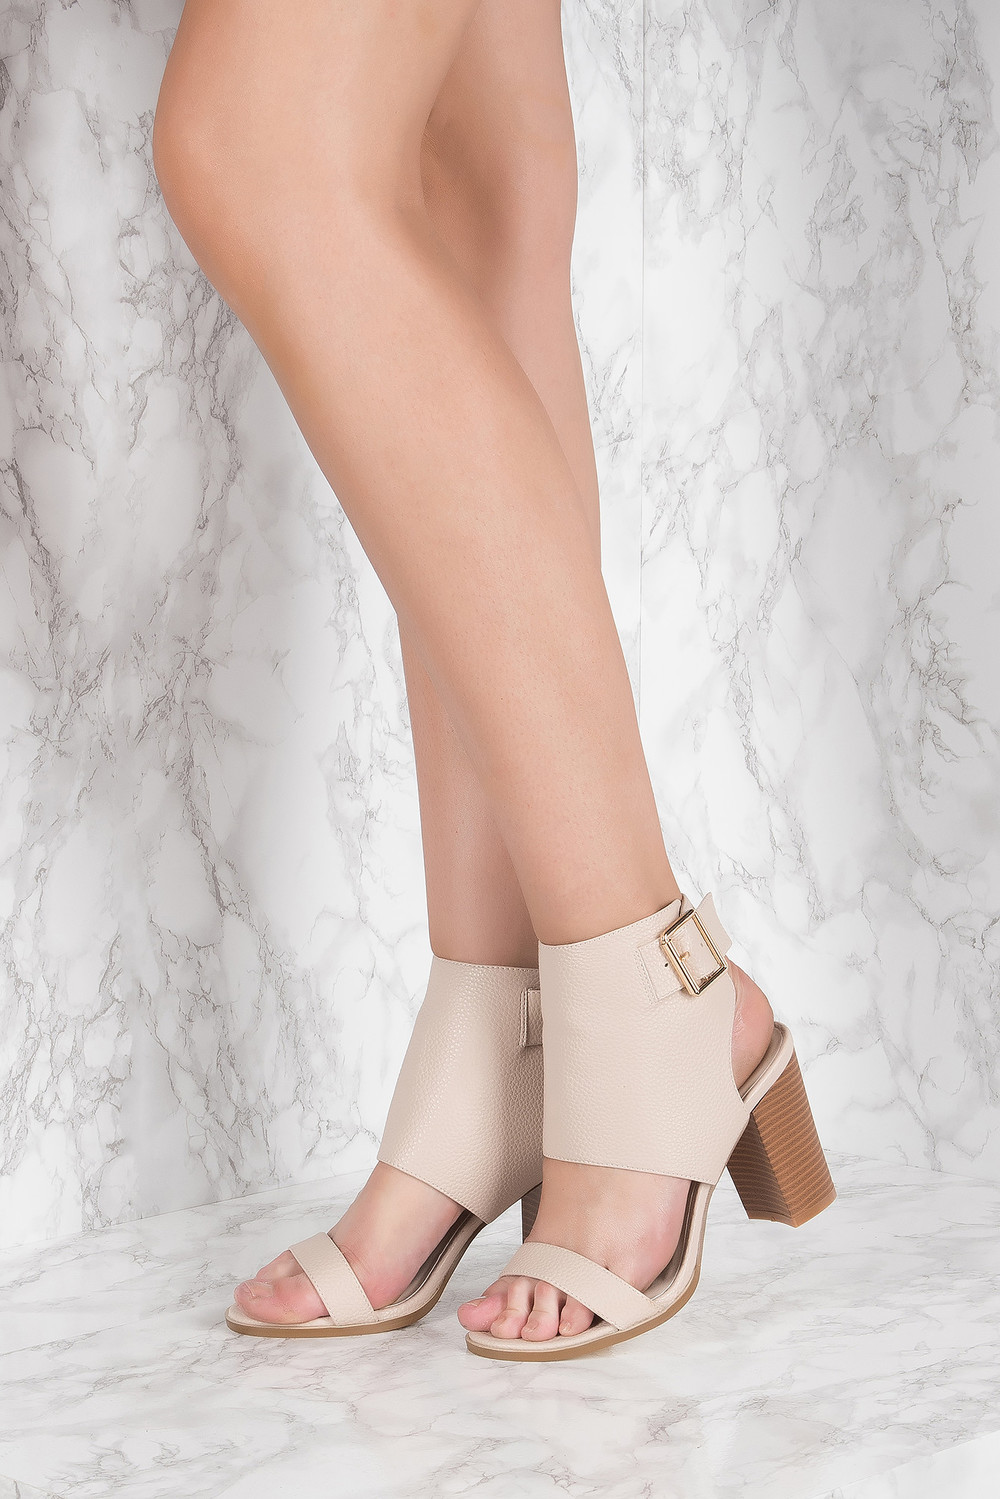 NA-KD Shoes Heeled Buckle Sandals